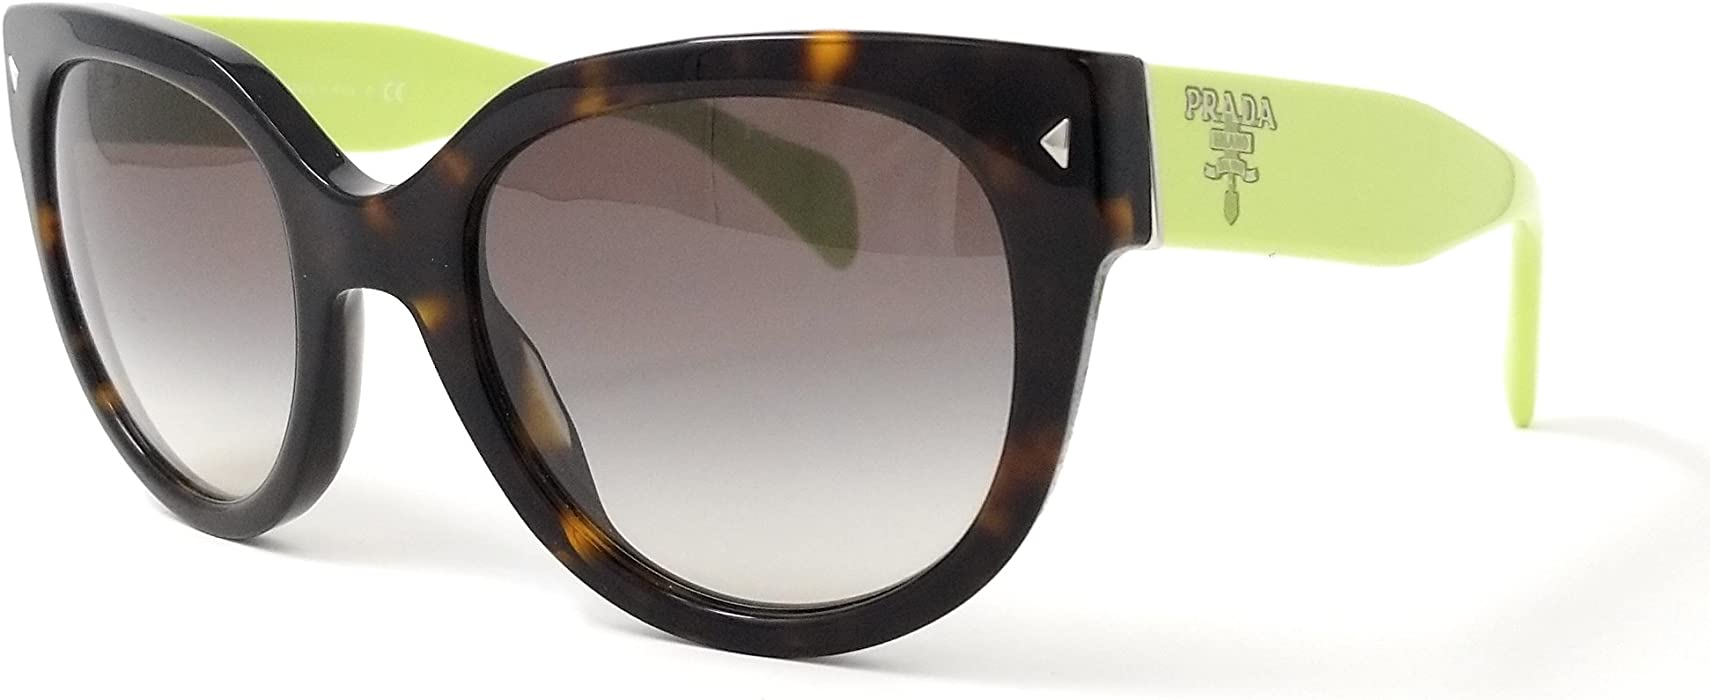 116a4d23fe Sunglasses PR 17OS - SWING QFL0A7 Women  gray gradient 54X22X140. Prada ...